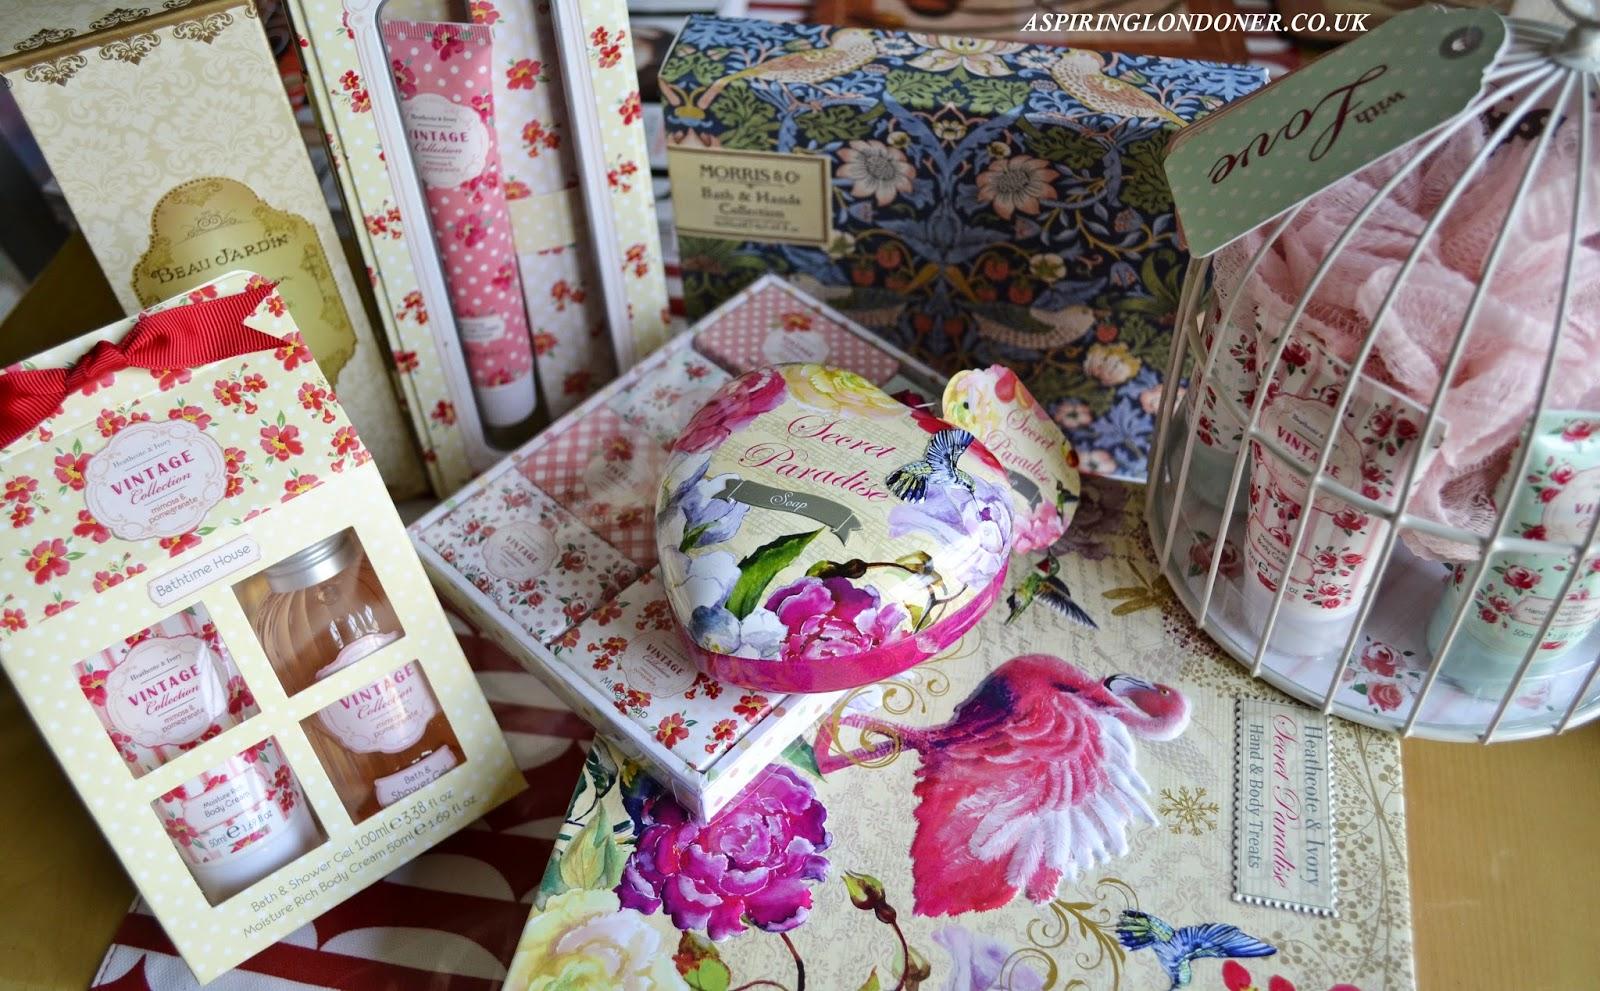 Heathcote & Ivory Gift Sets - Aspiring Londoner